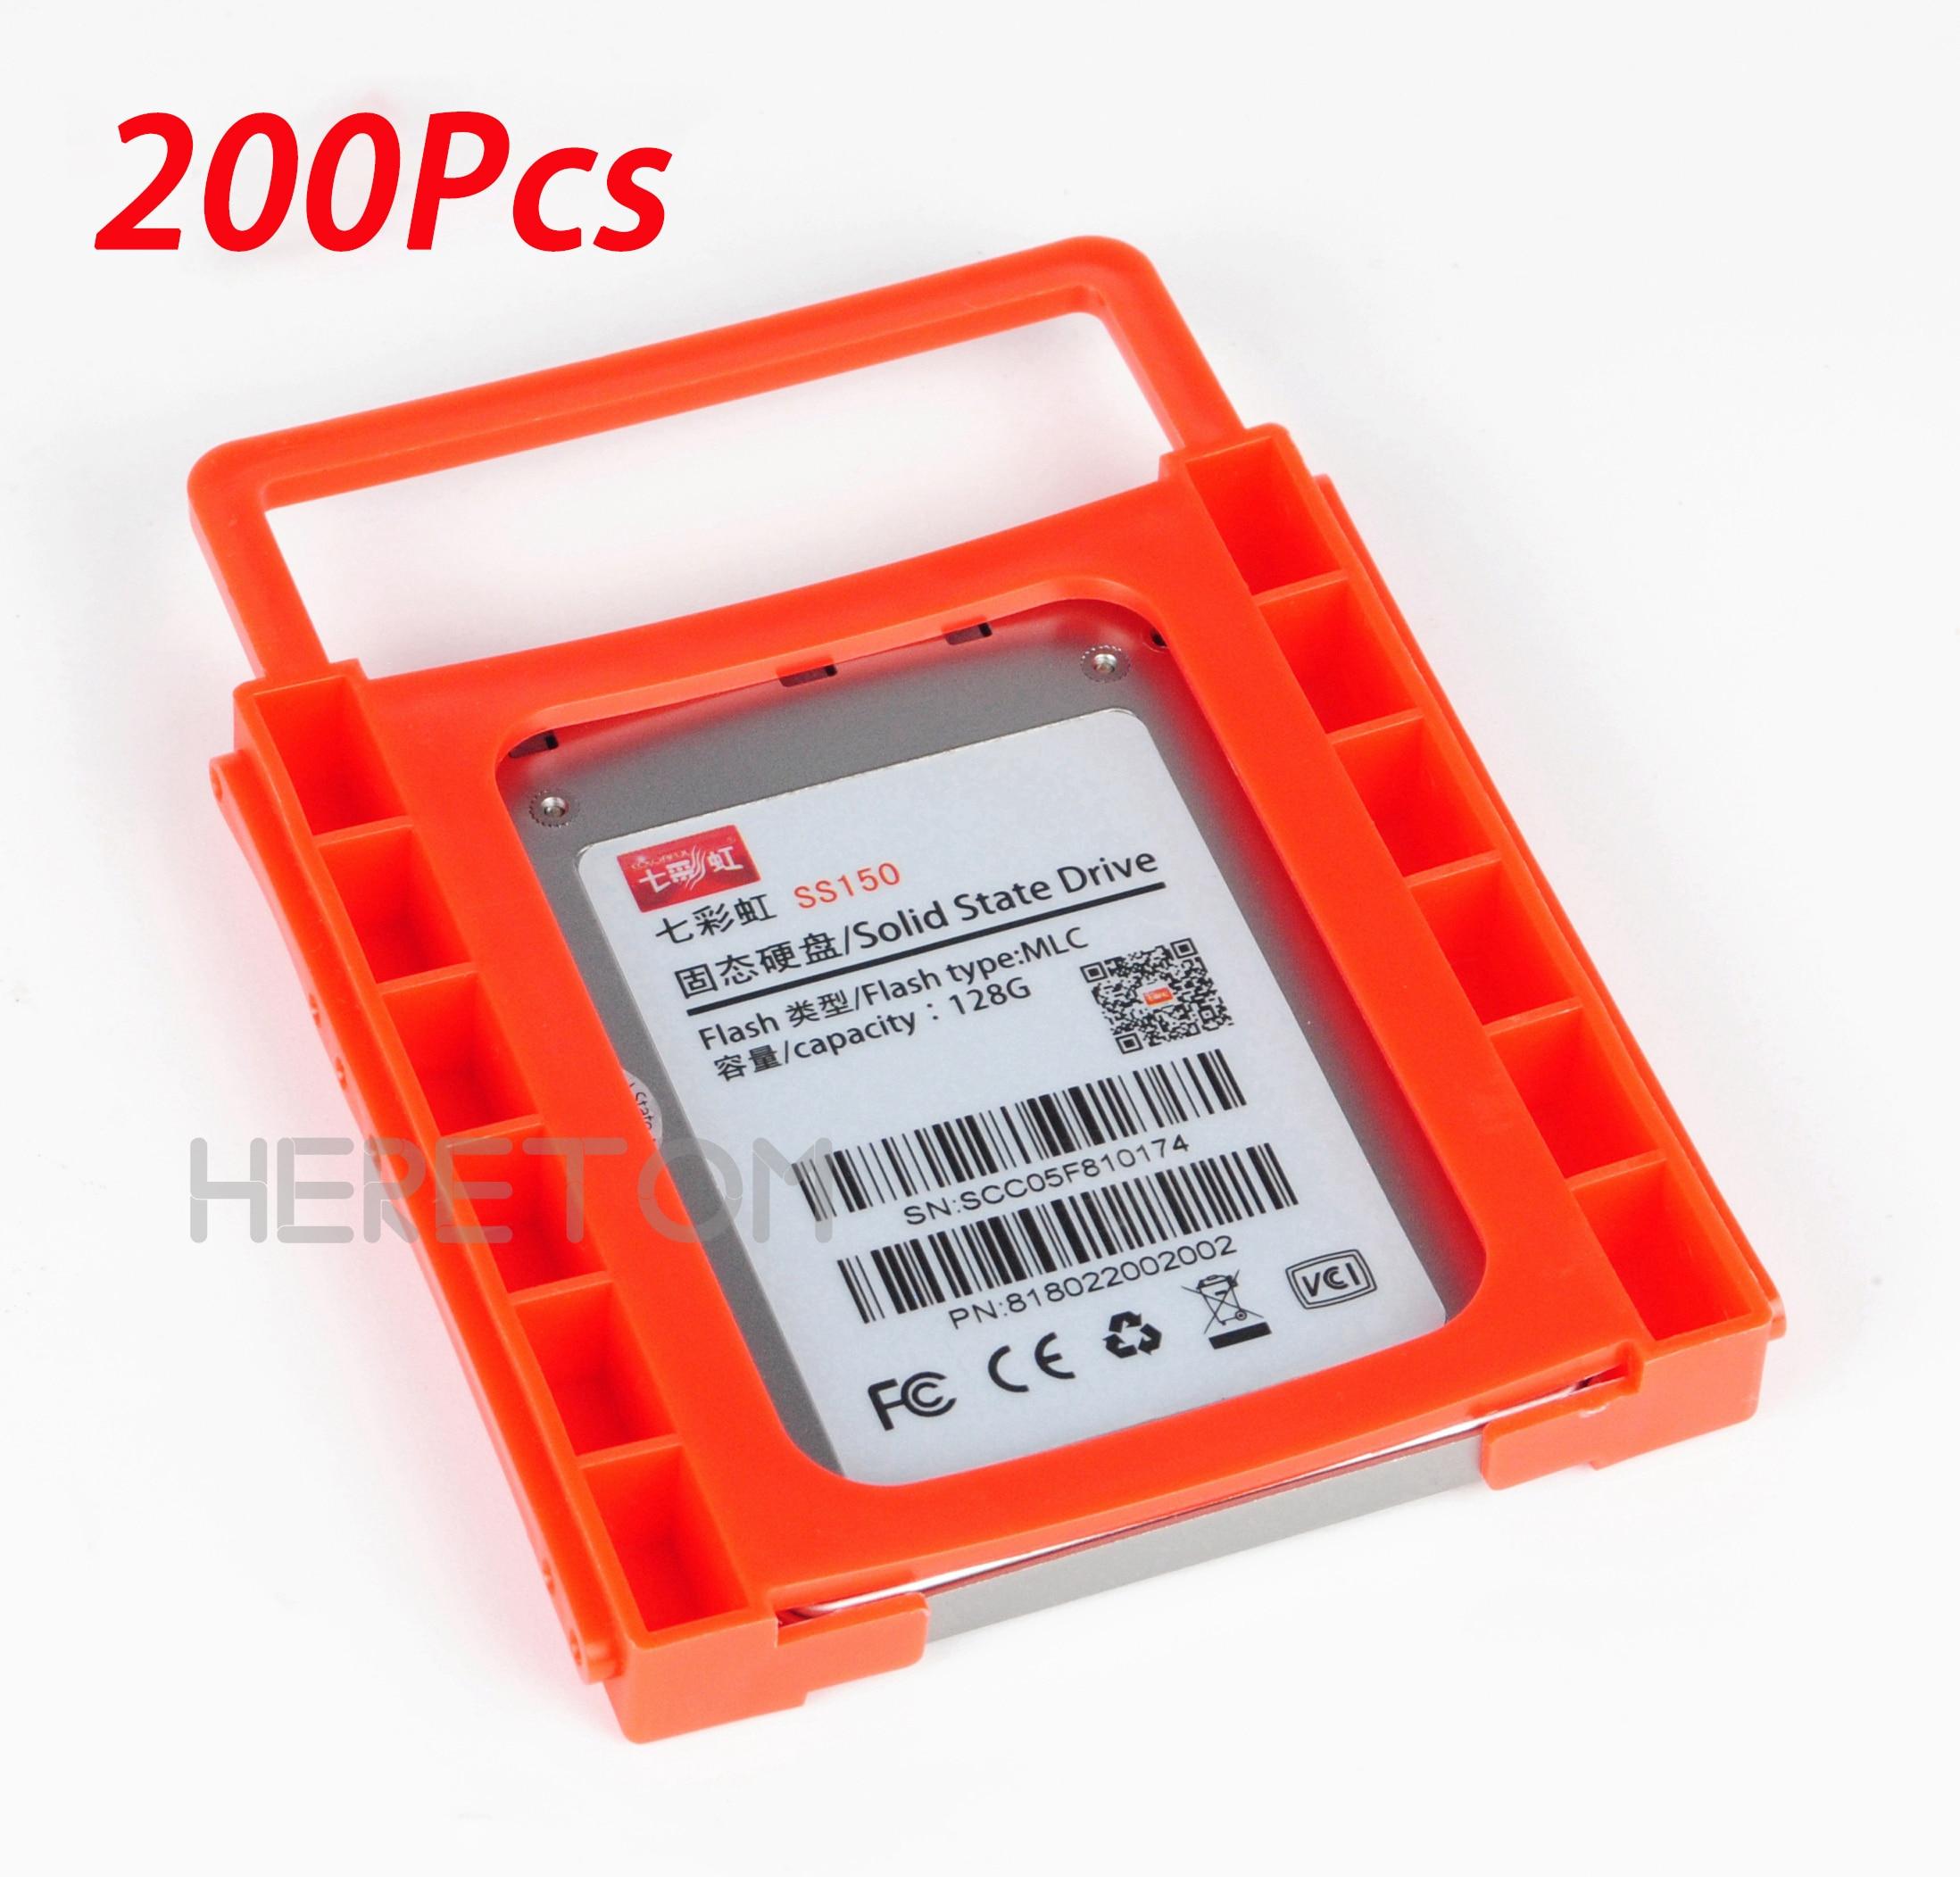 200PCS Express Free Shipping 2.5